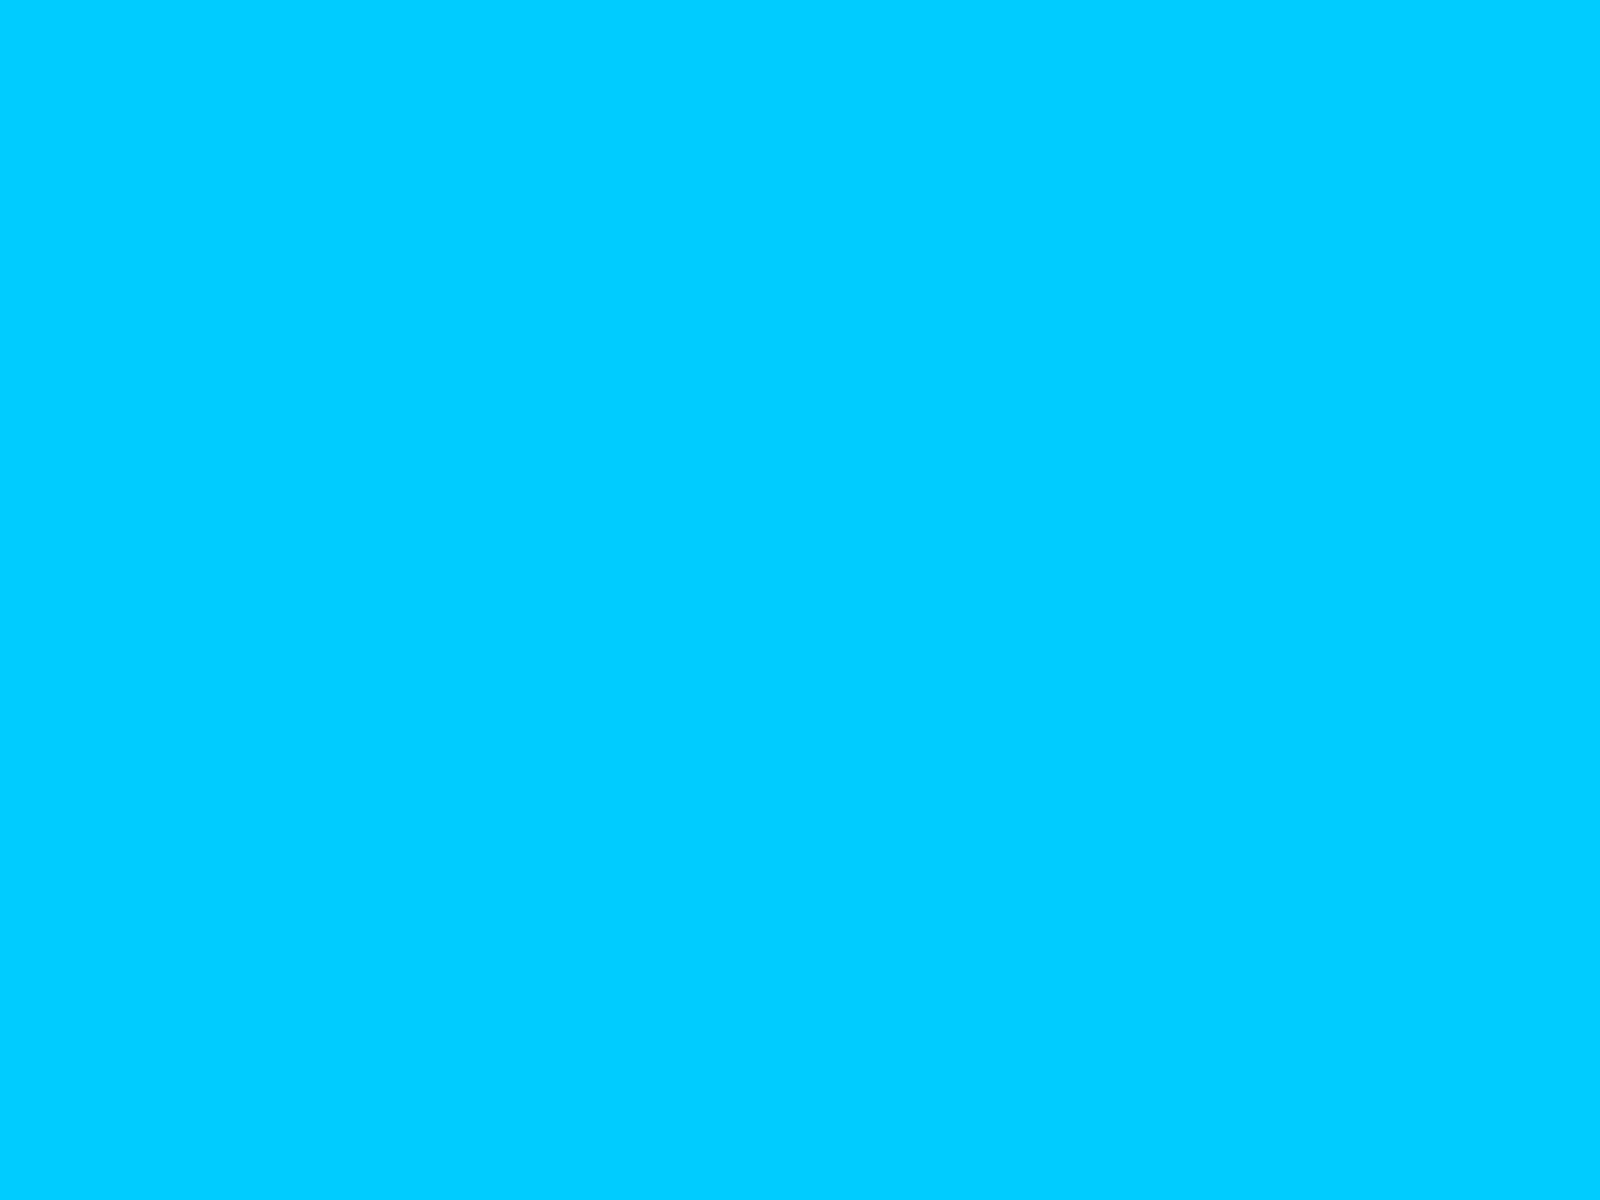 1600x1200 Vivid Sky Blue Solid Color Background